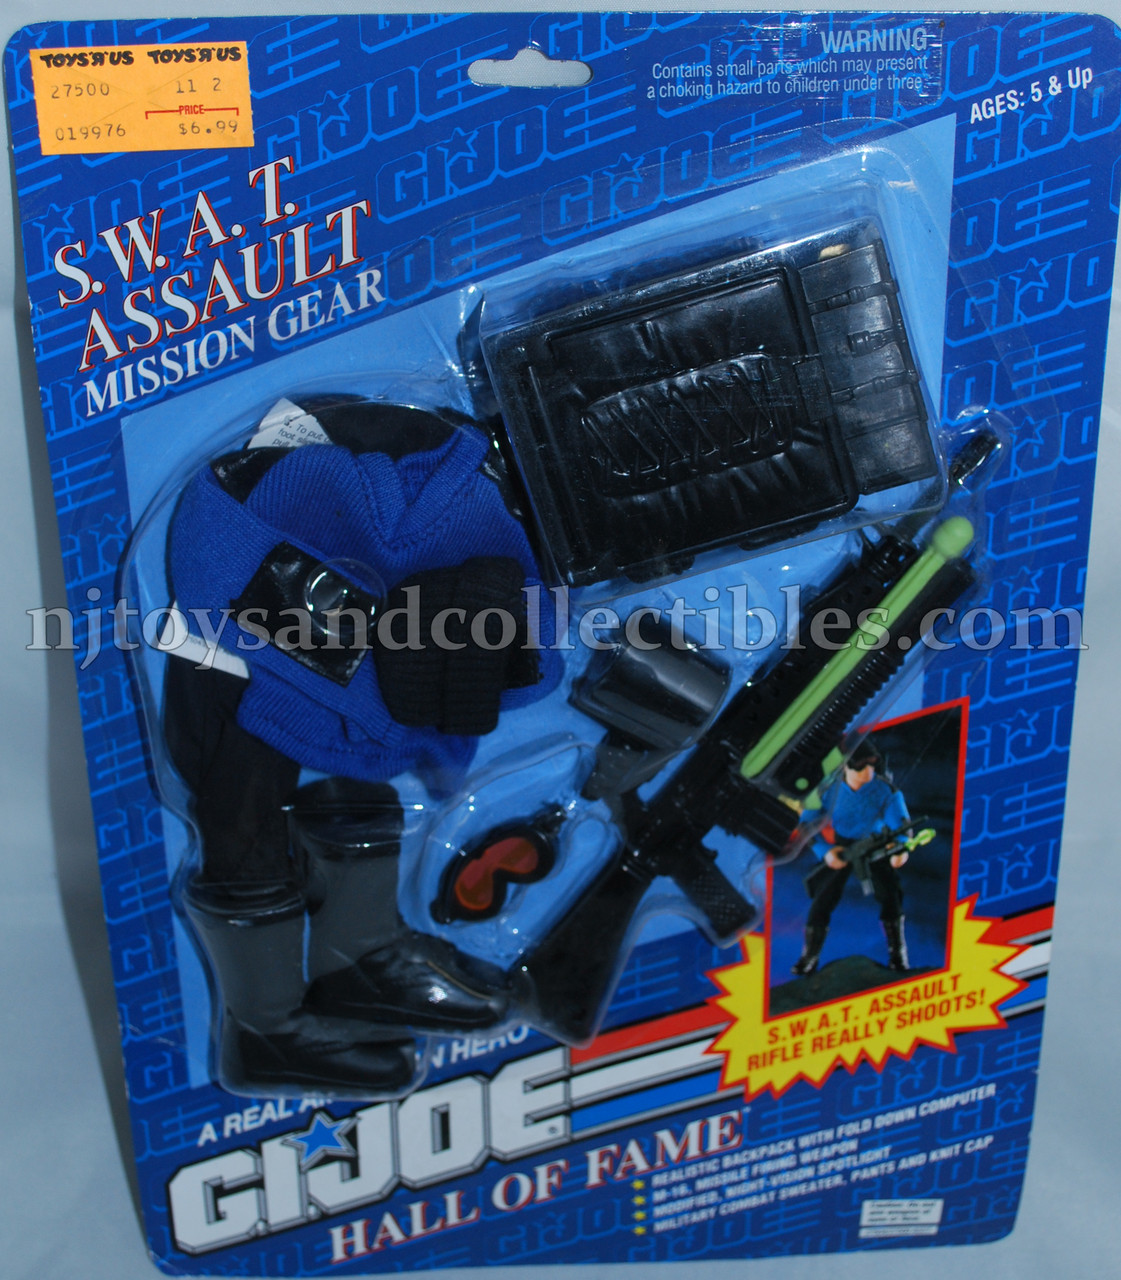 GI Joe Hall of Fame SWAT Assault Mission Gear Pack